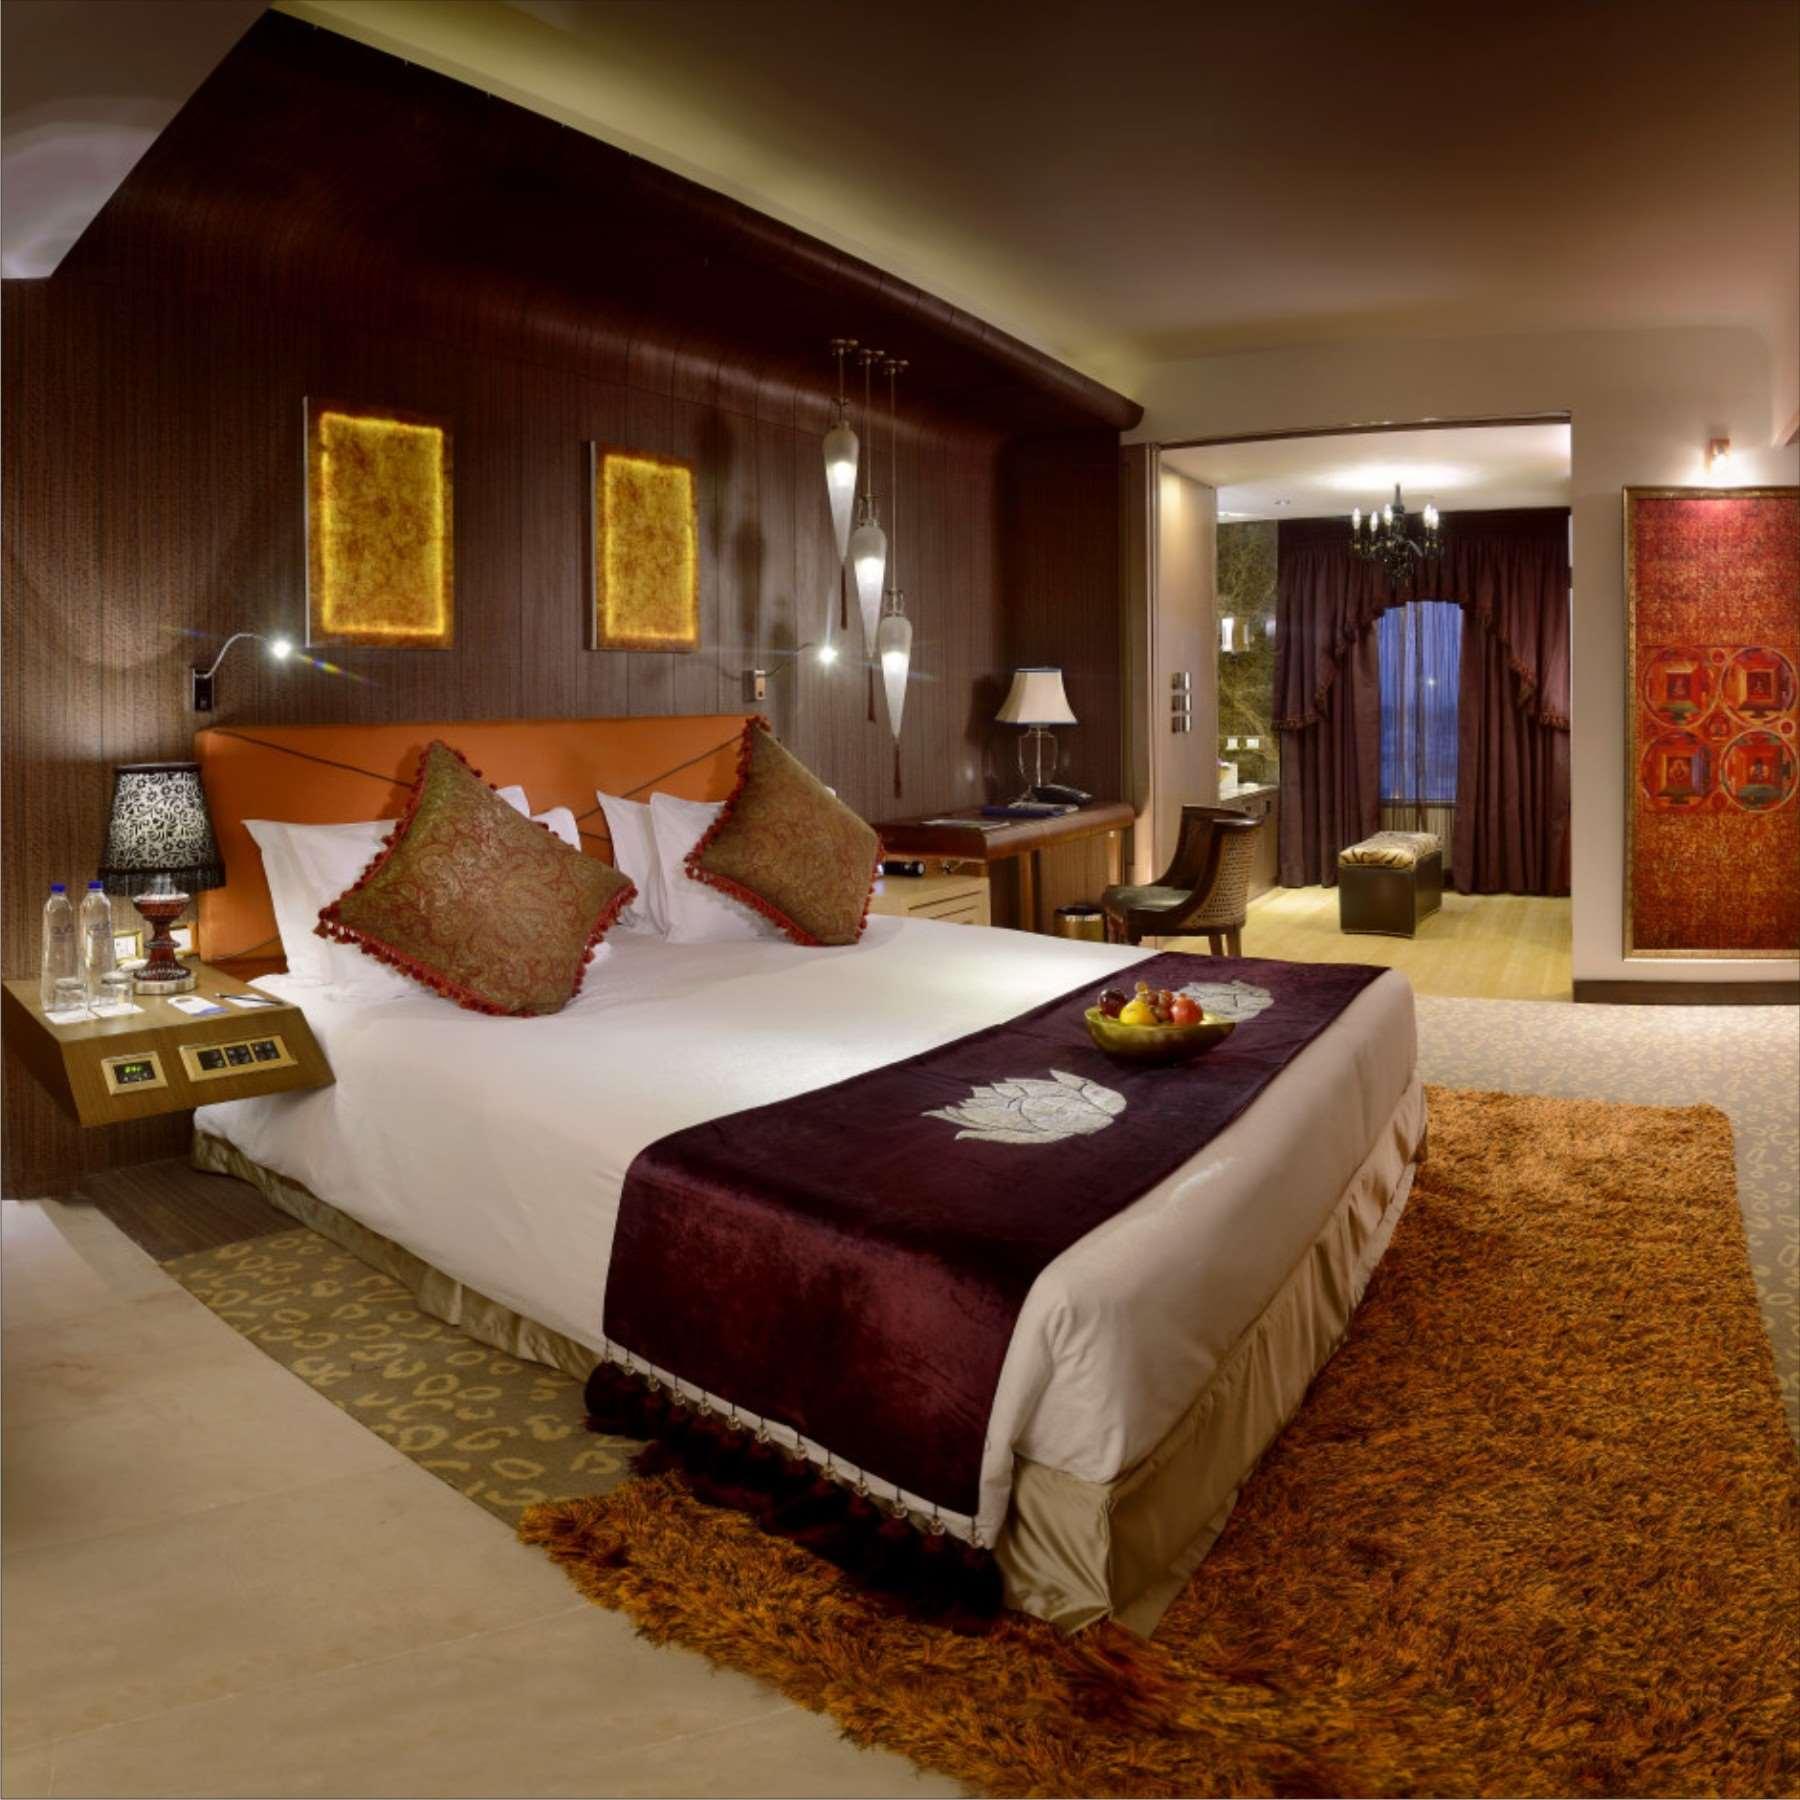 Radisson Blu Hotel MBD Ludhiana